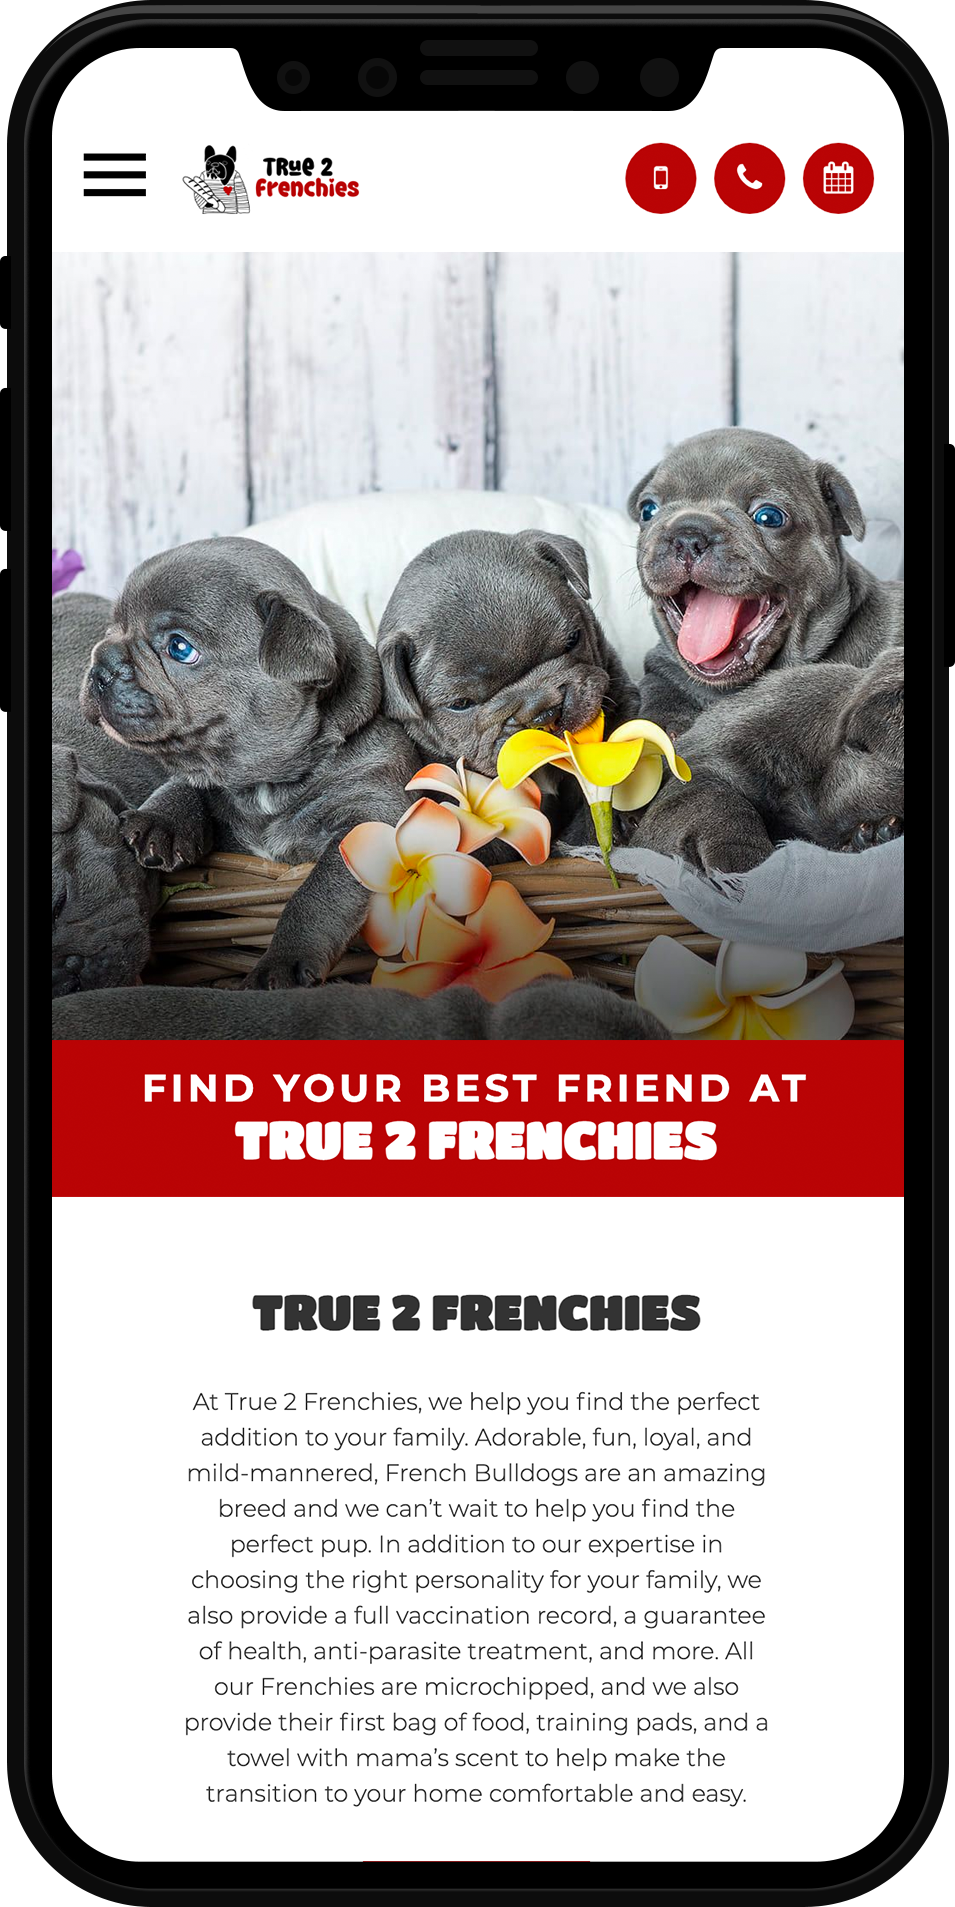 True 2 Frenchies